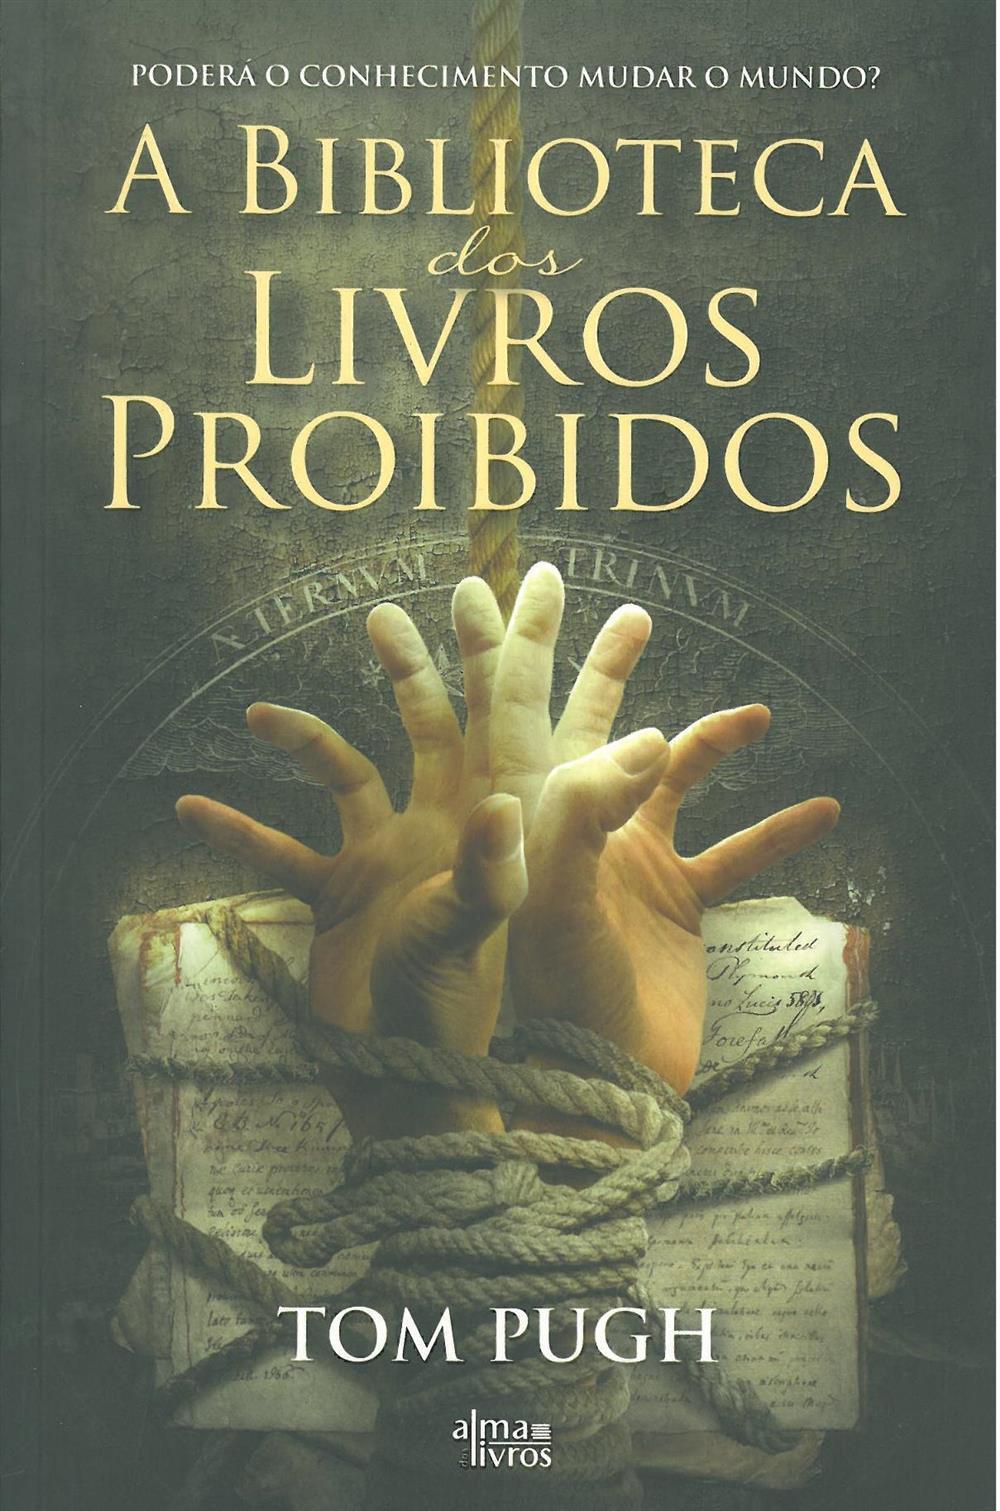 A biblioteca dos livros proibidos_.jpg